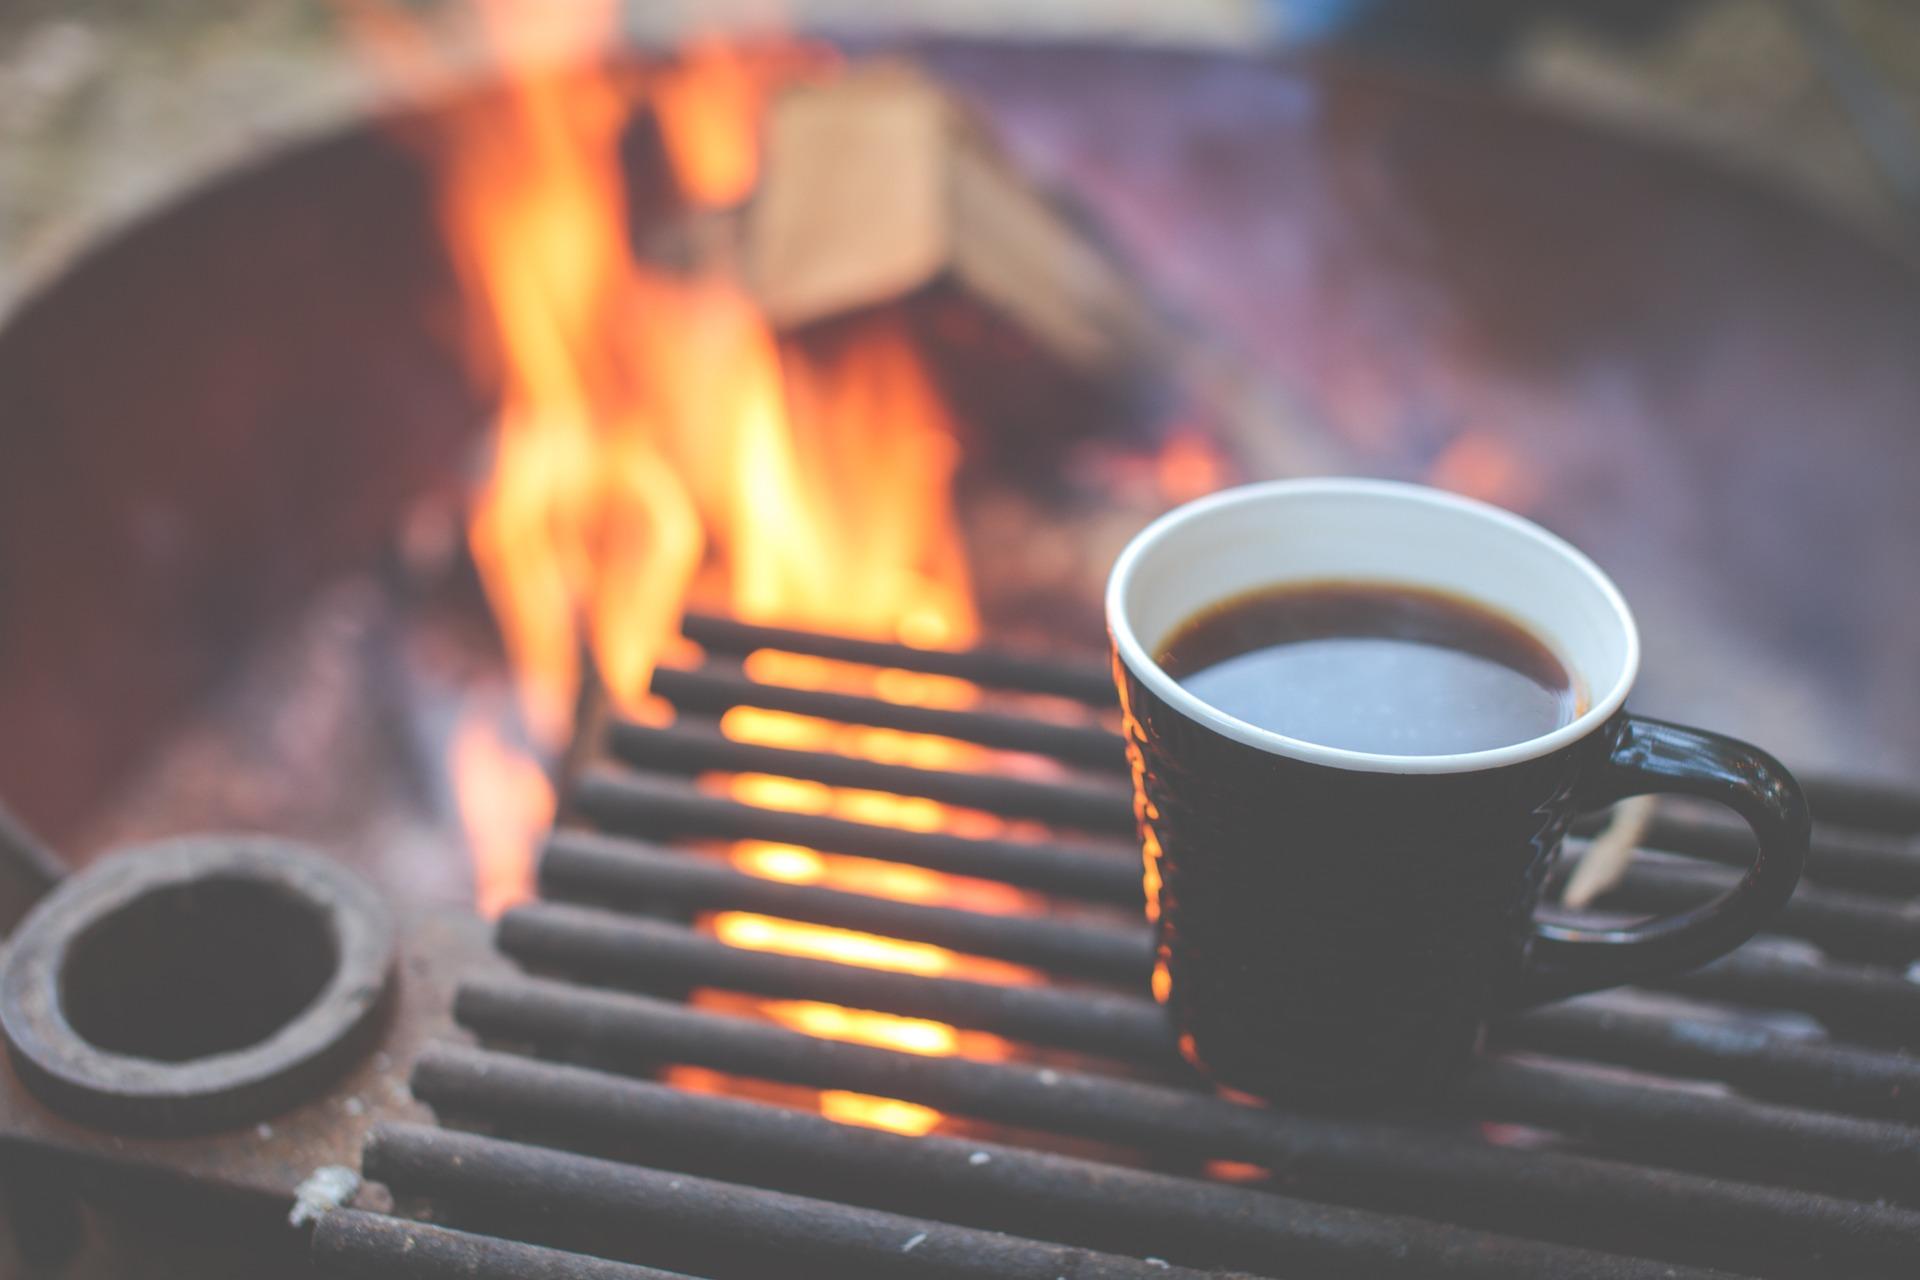 coffee-1031139_1920.jpg